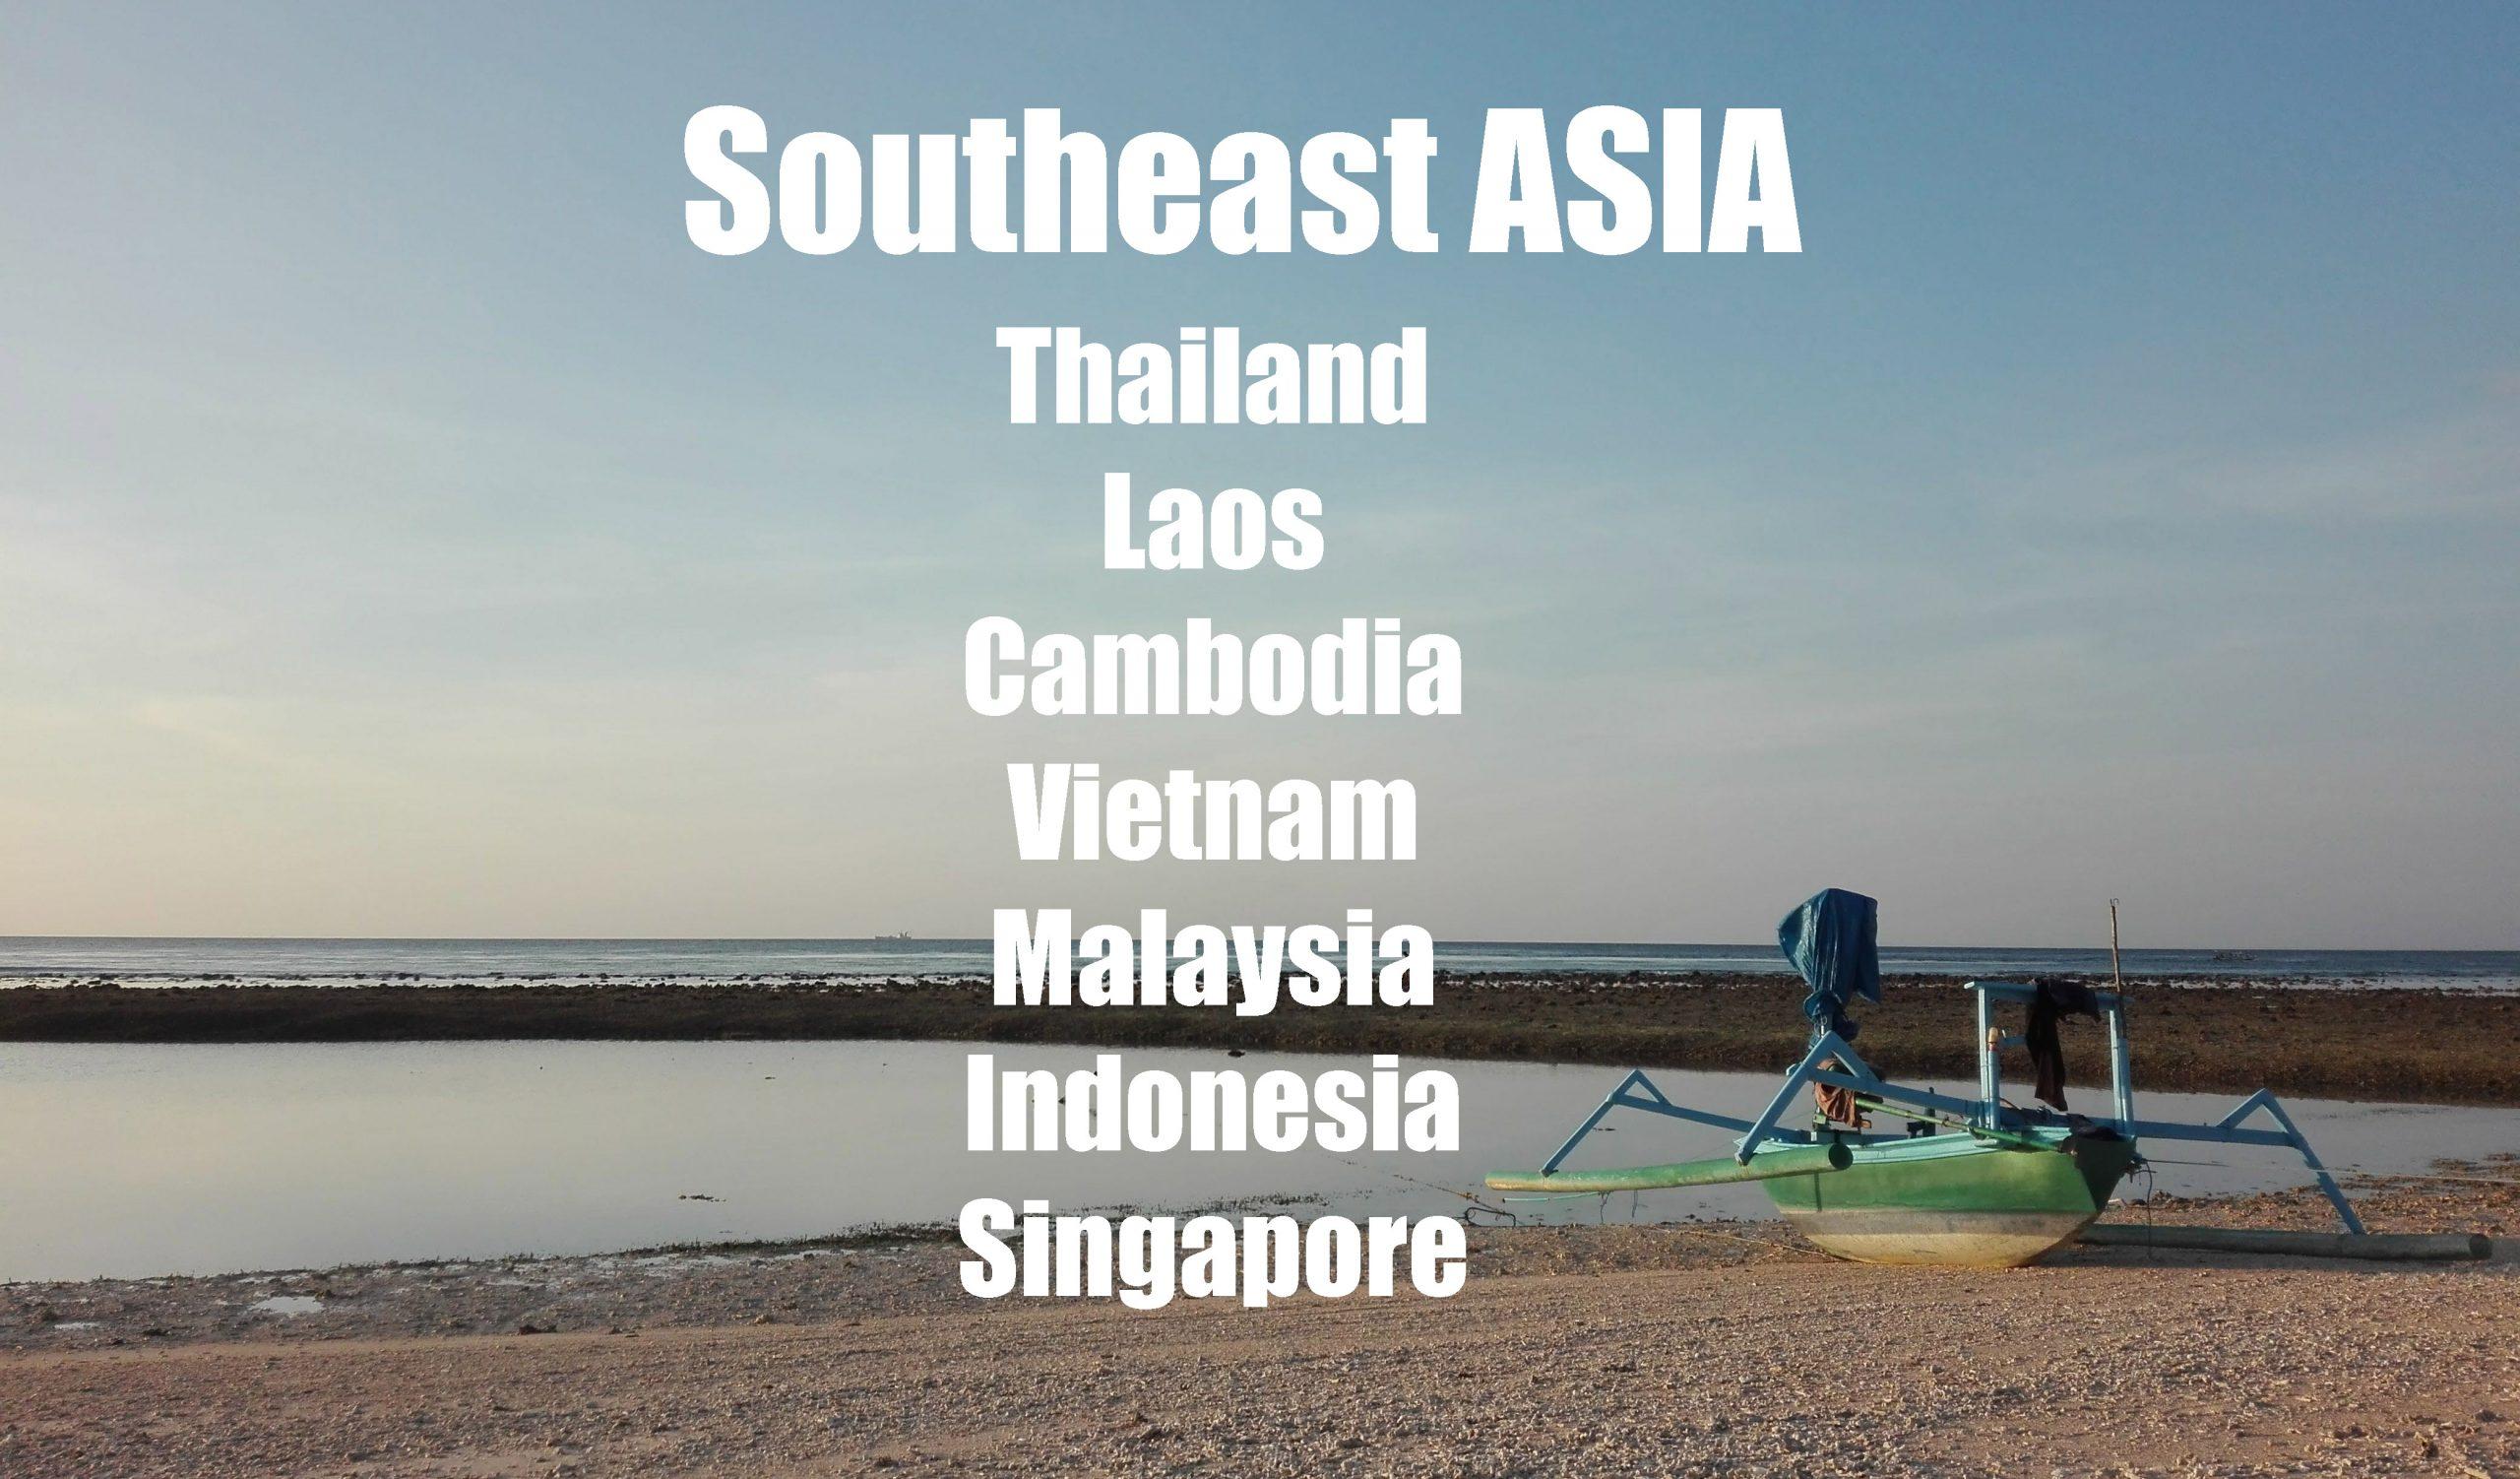 Southeast Asia: Thailand, Laos, Cambodia, Vietnam, Malaysia, Indonesia, Singapore